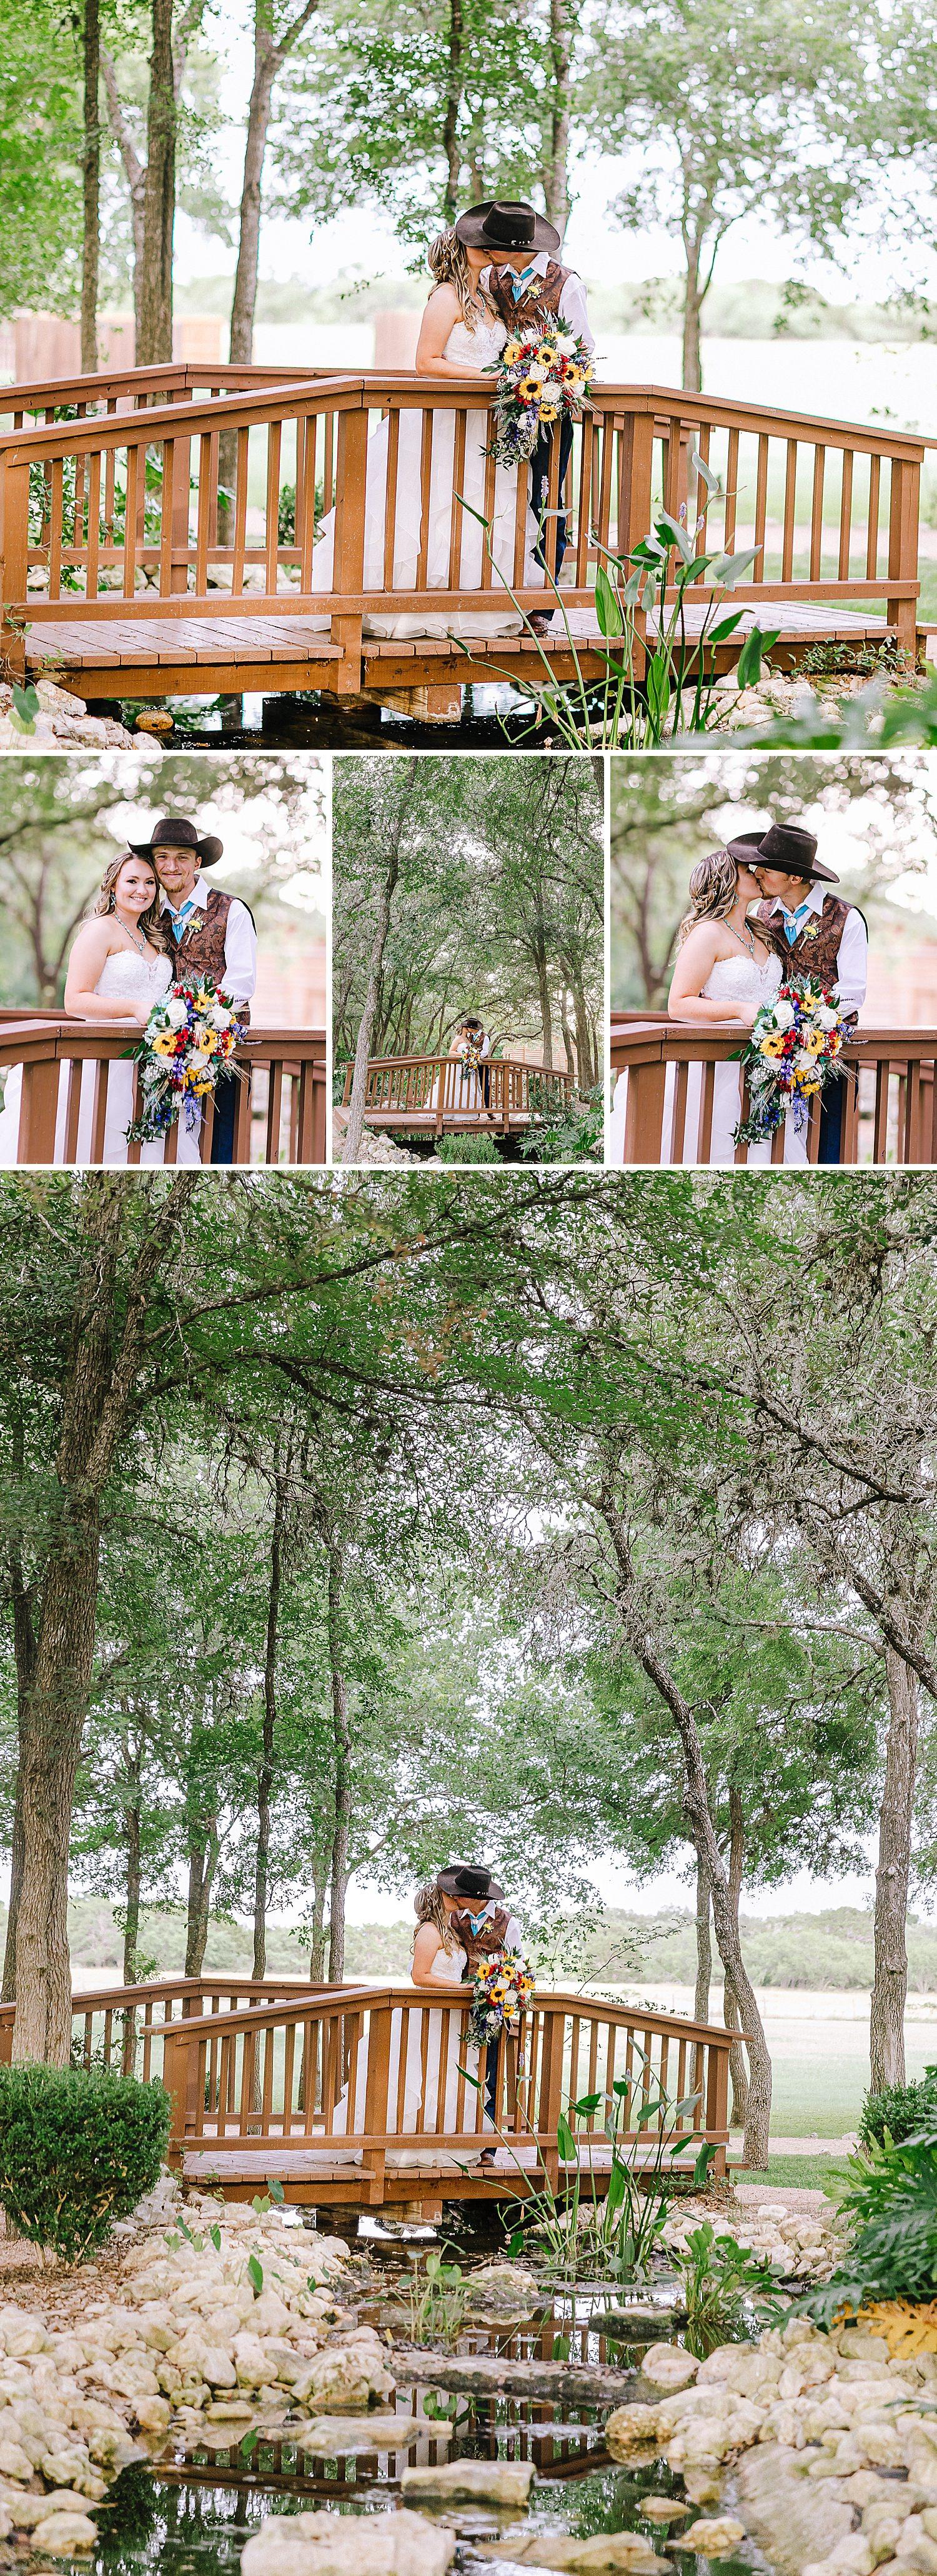 Carly-Barton-Photography-Old-Town-Texas-Rustic-Wedding-Photos-Sunflowers-Boots-Kyle-Texas_0063.jpg